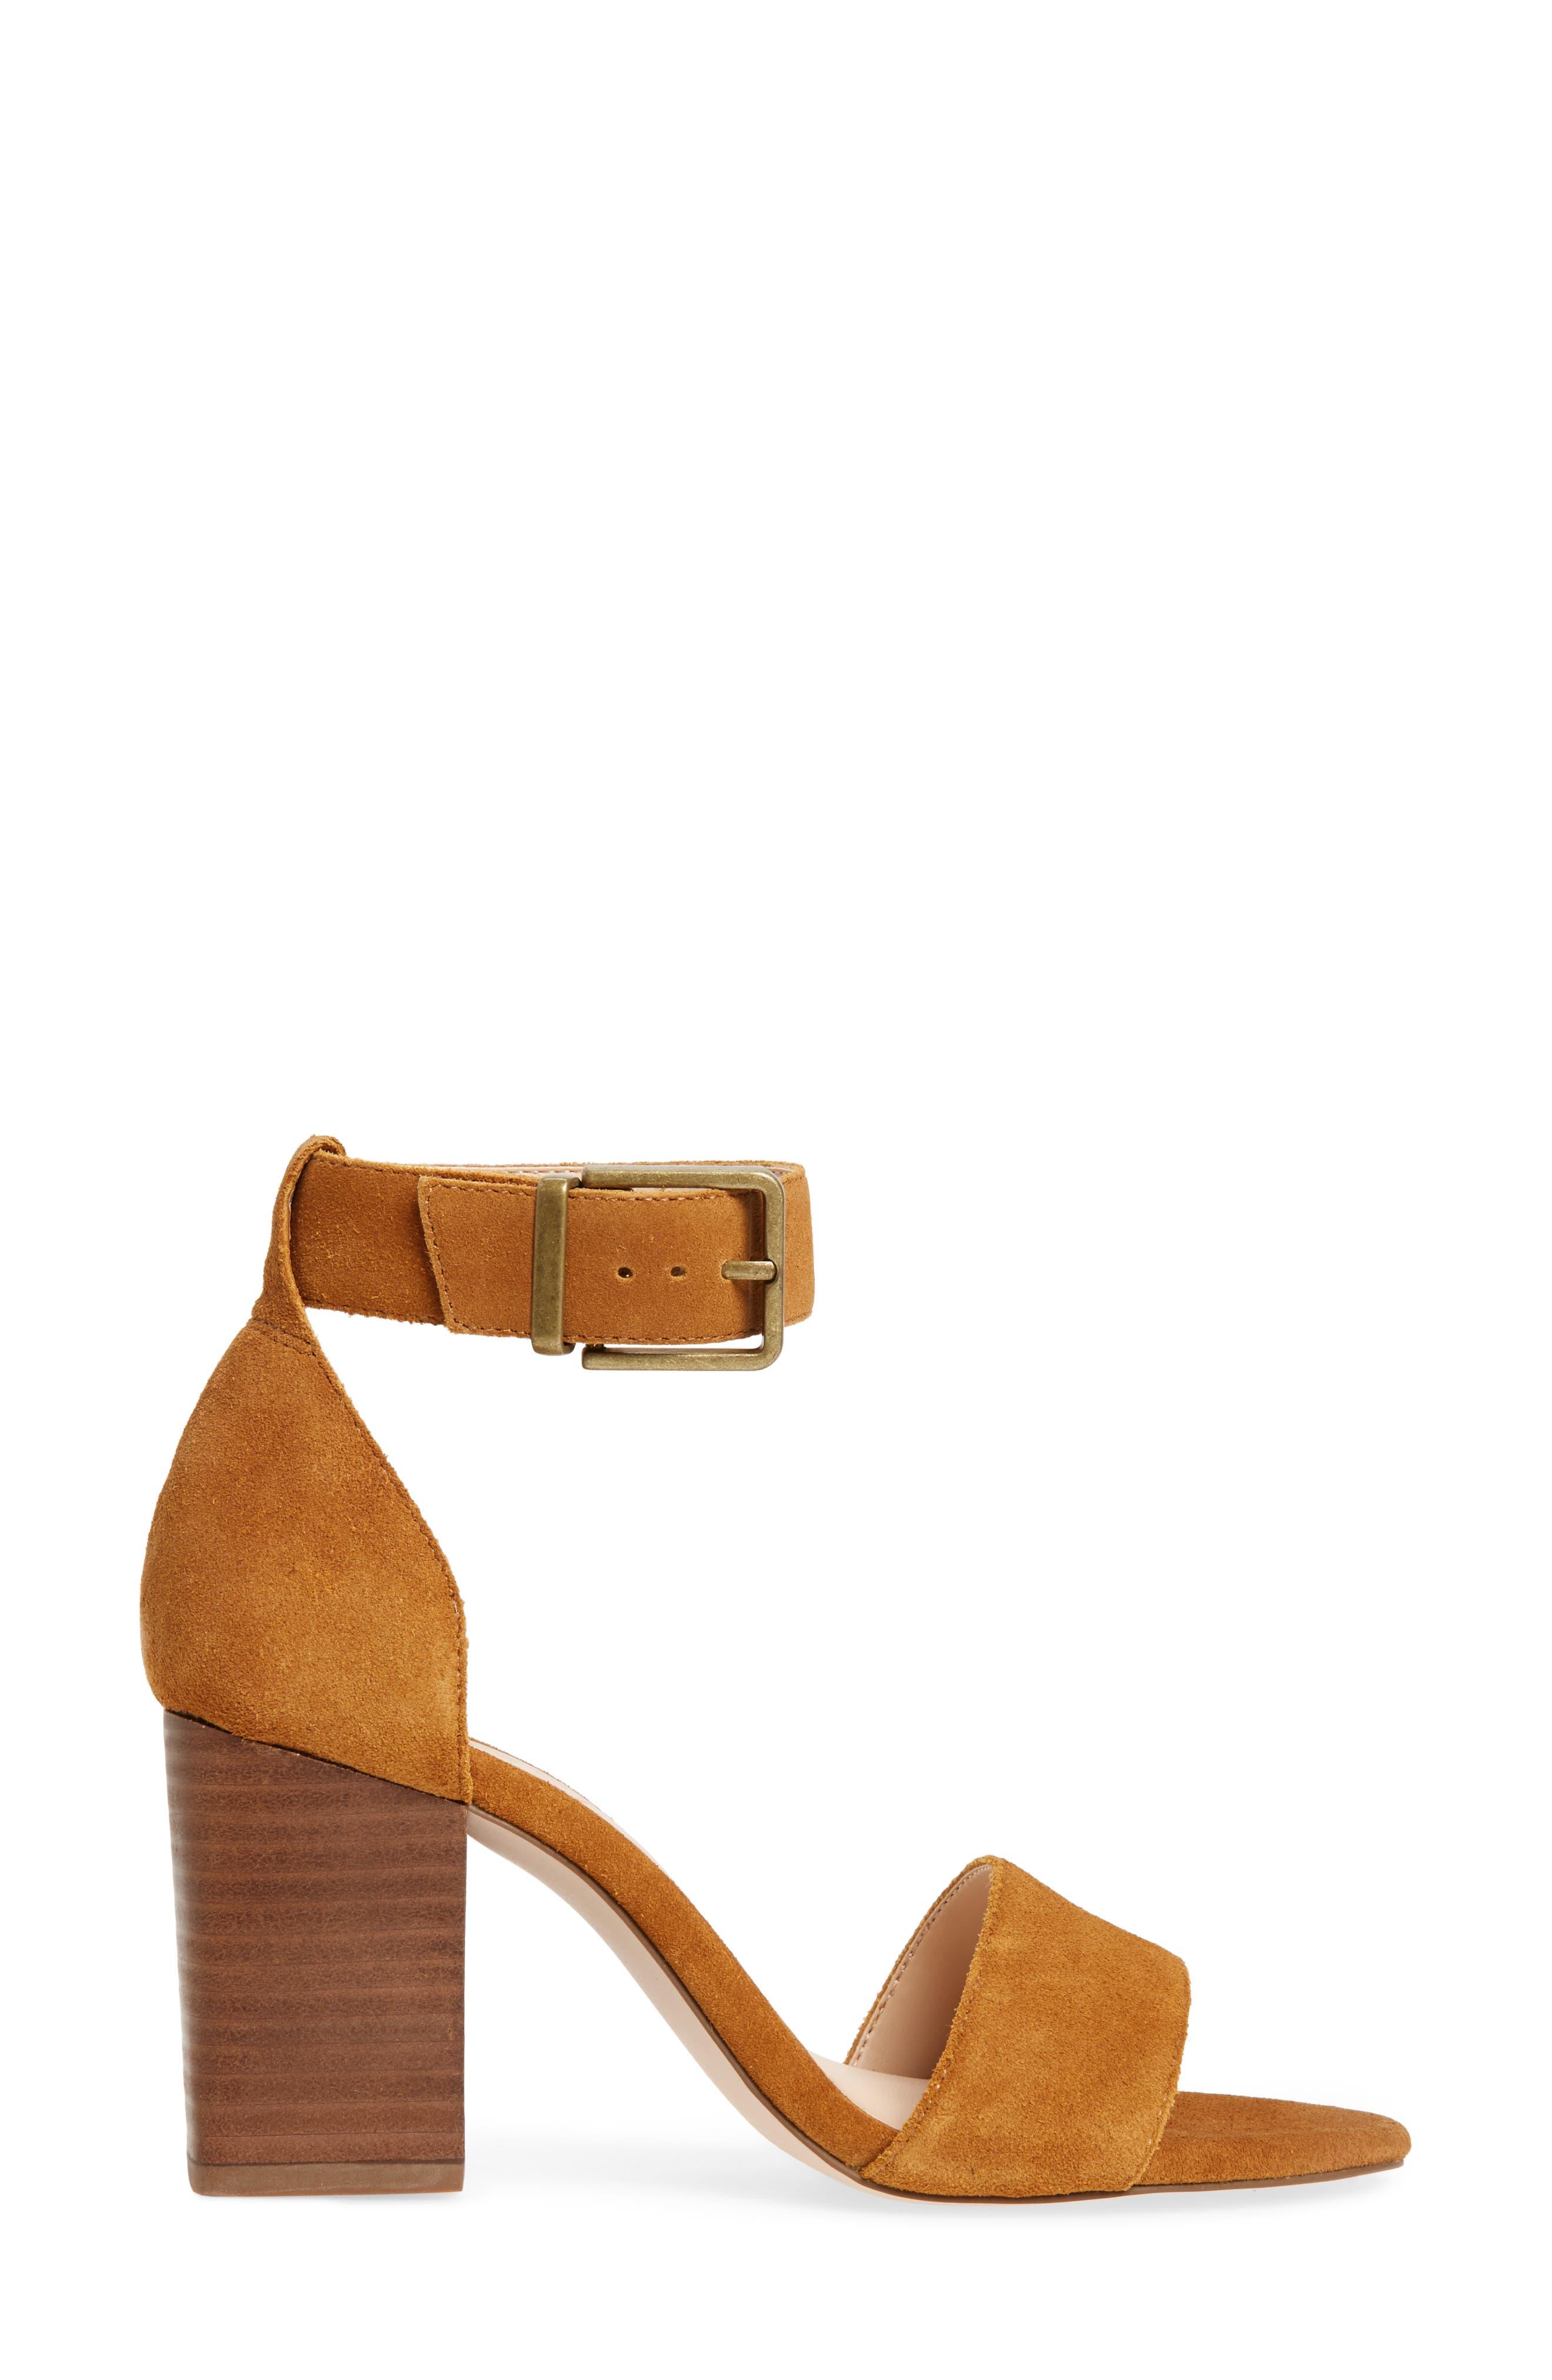 Alternate Image 3  - Sole Society Montana Sandal (Women)